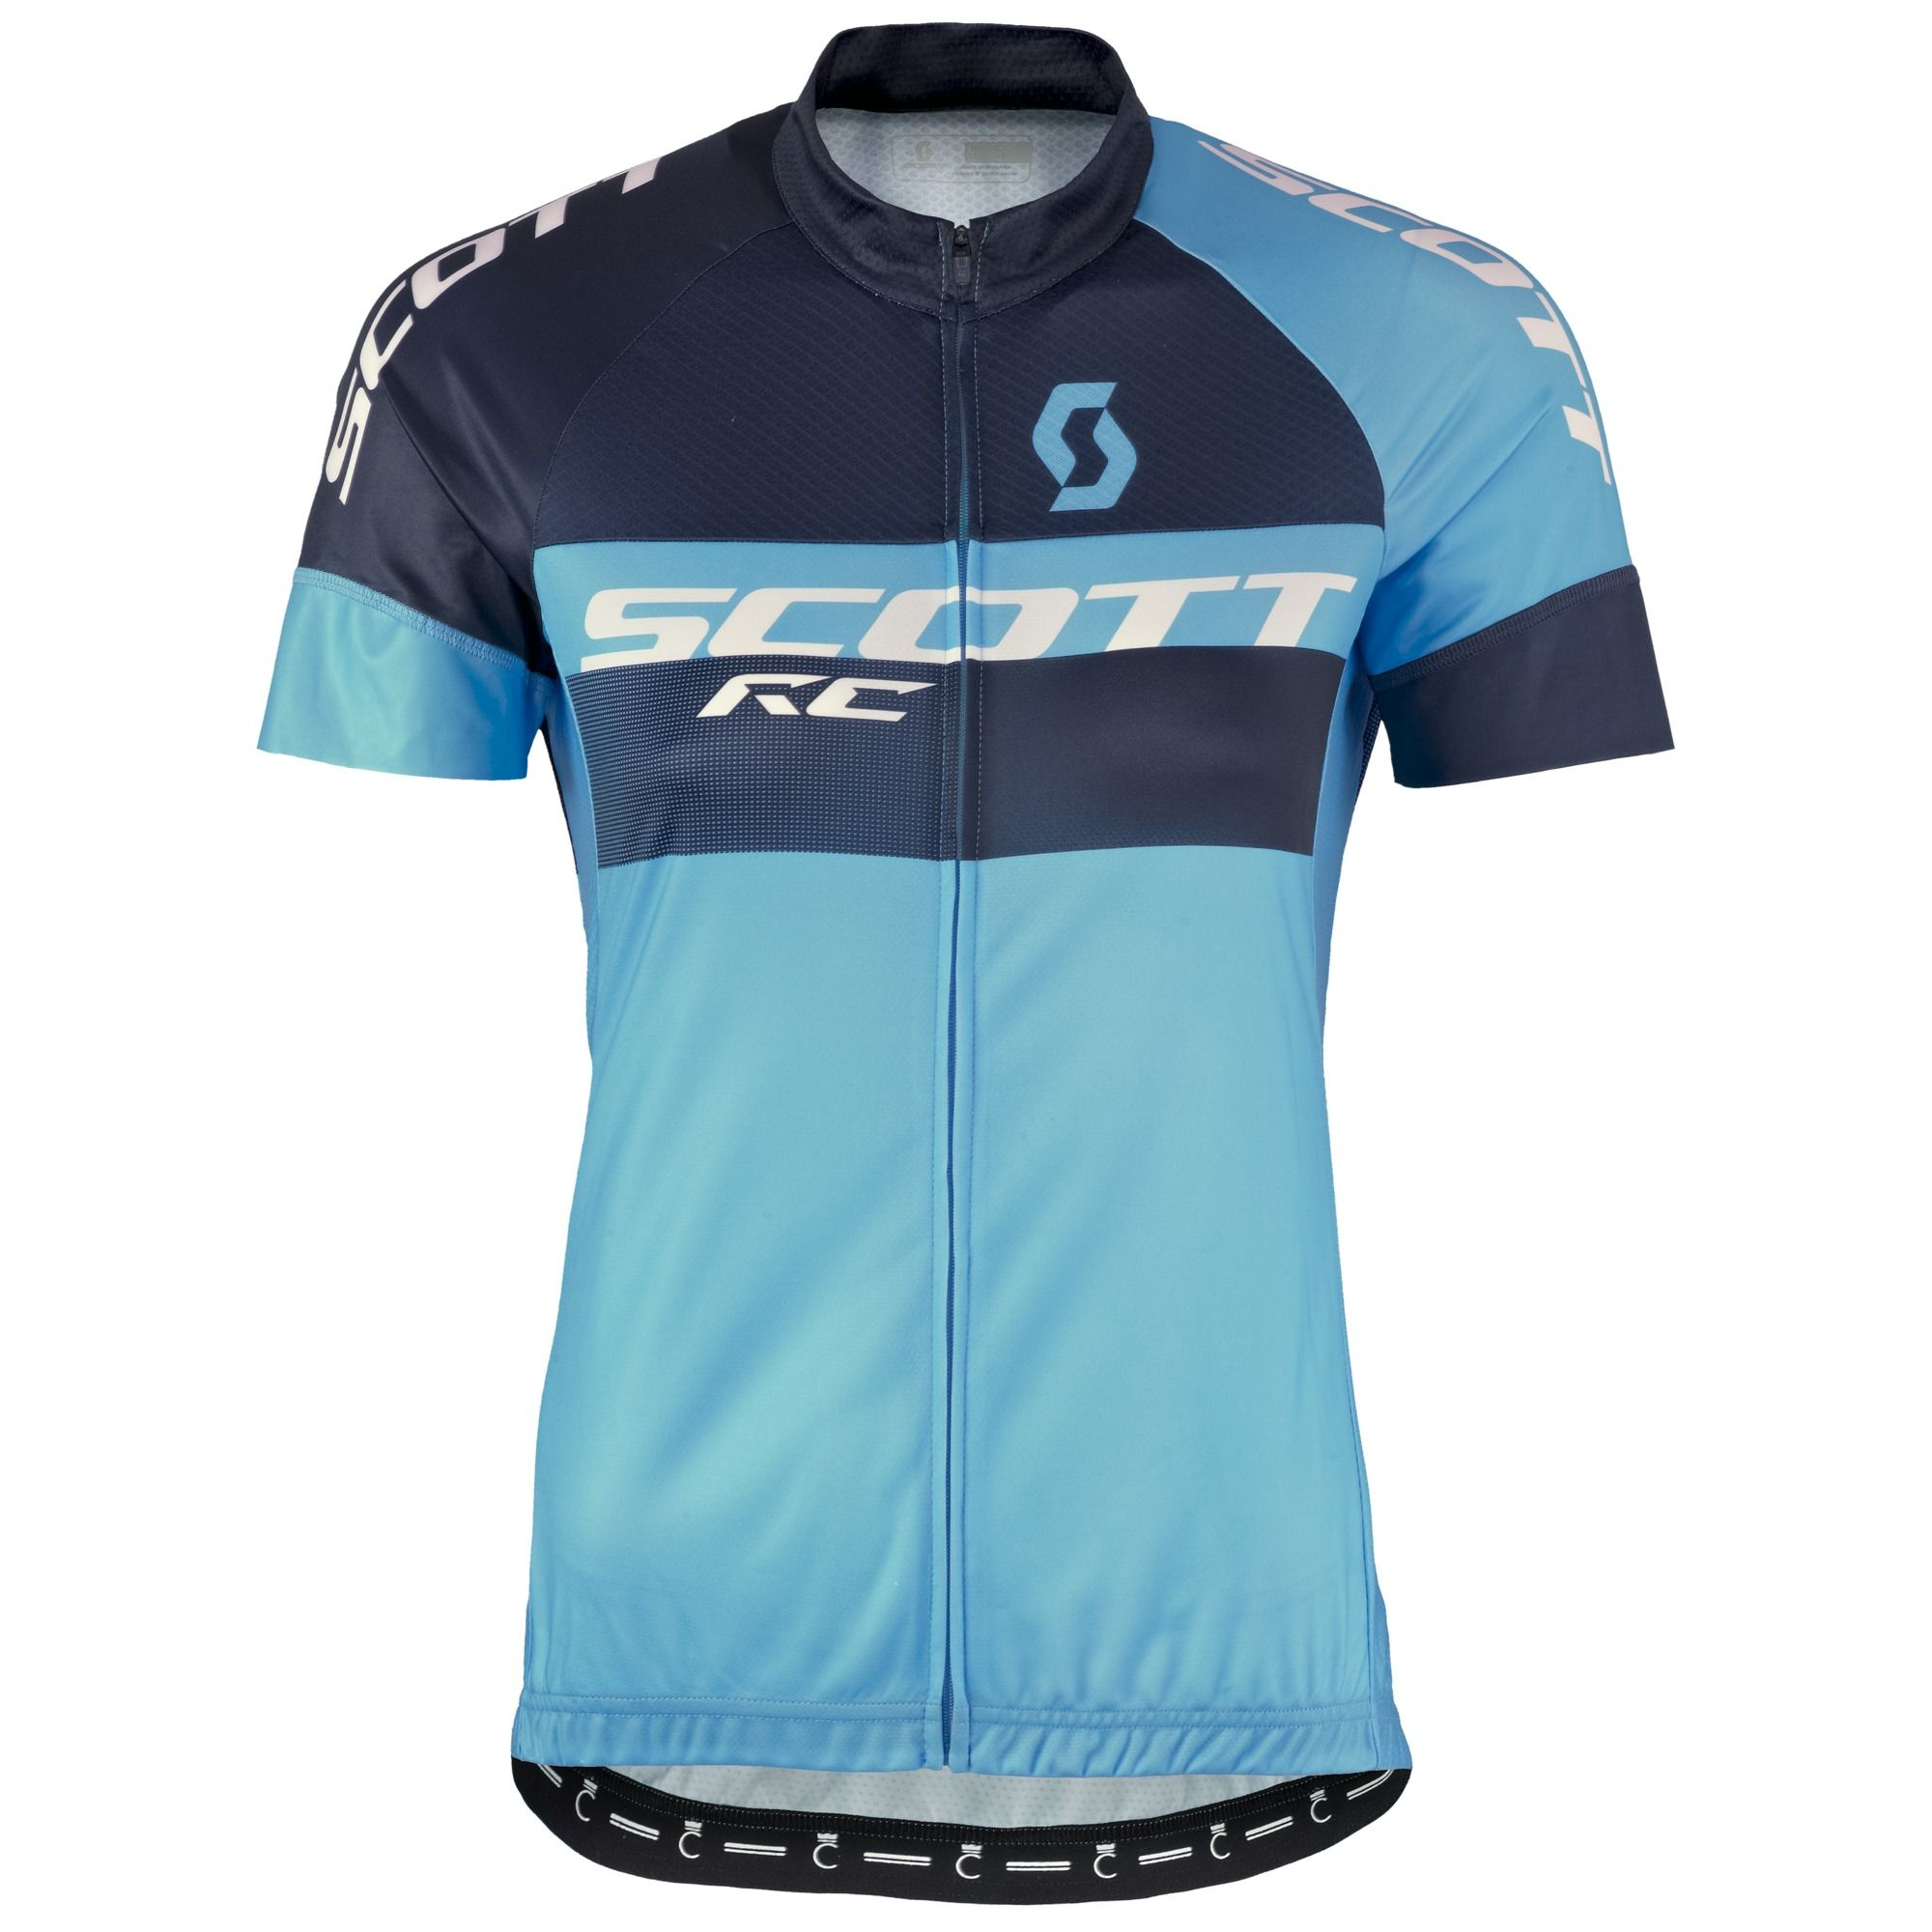 Scott Sports Women s Shirt RC Pro Tec Short Sleeve Shirt - 241791 (Blue  Atoll Blue Nights - M) 2162e537b